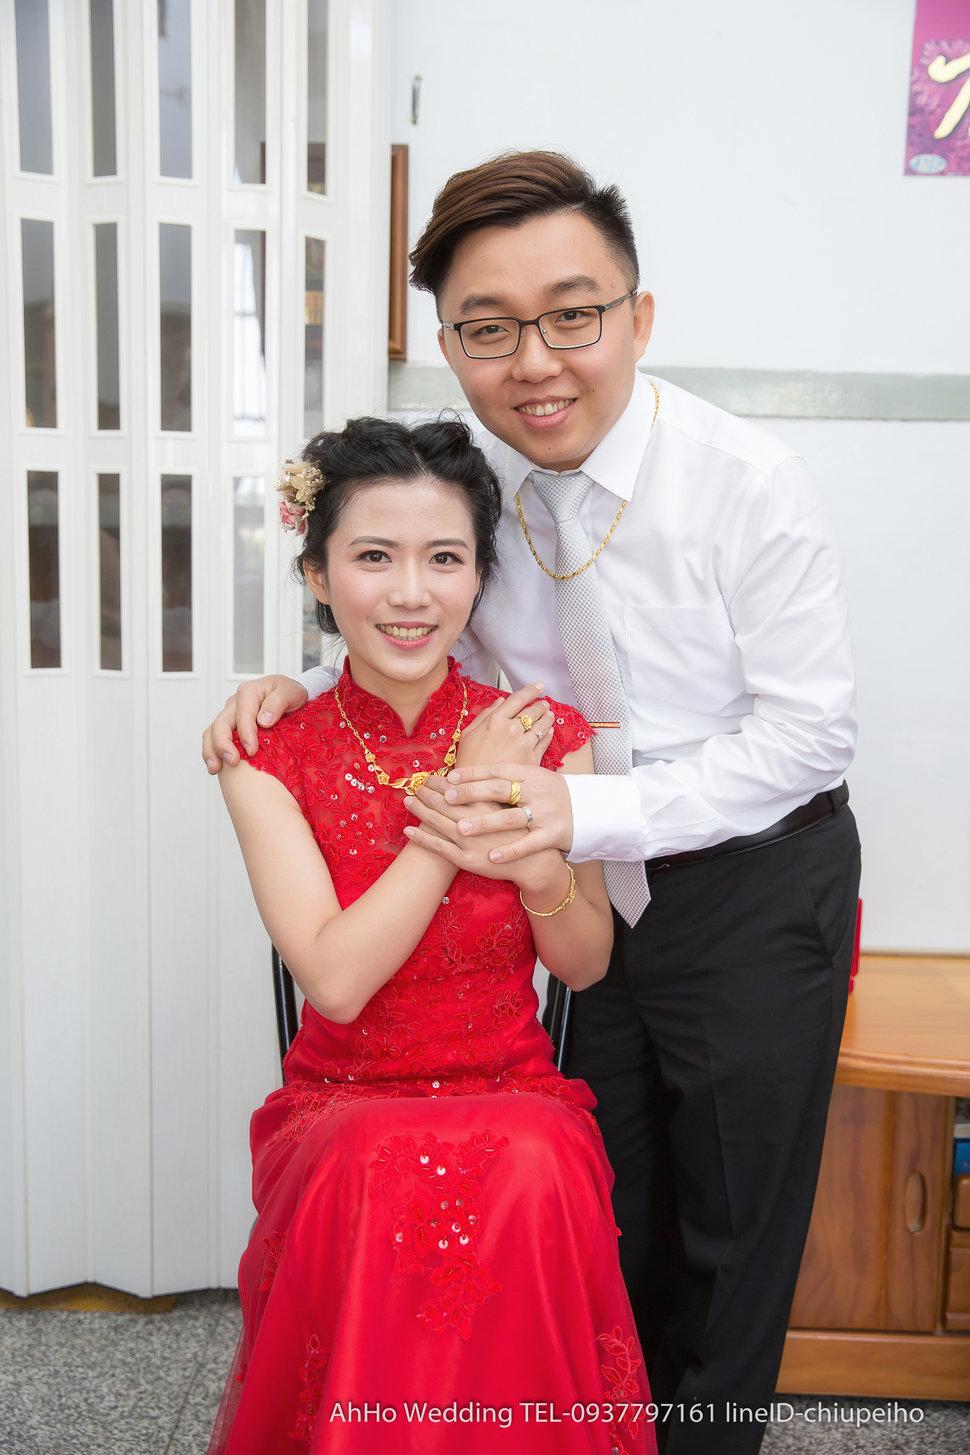 AhHo Wedding TEL-0937797161 lineID-chiupeiho (52 - 163) - AhHoWedding/阿河婚攝《結婚吧》